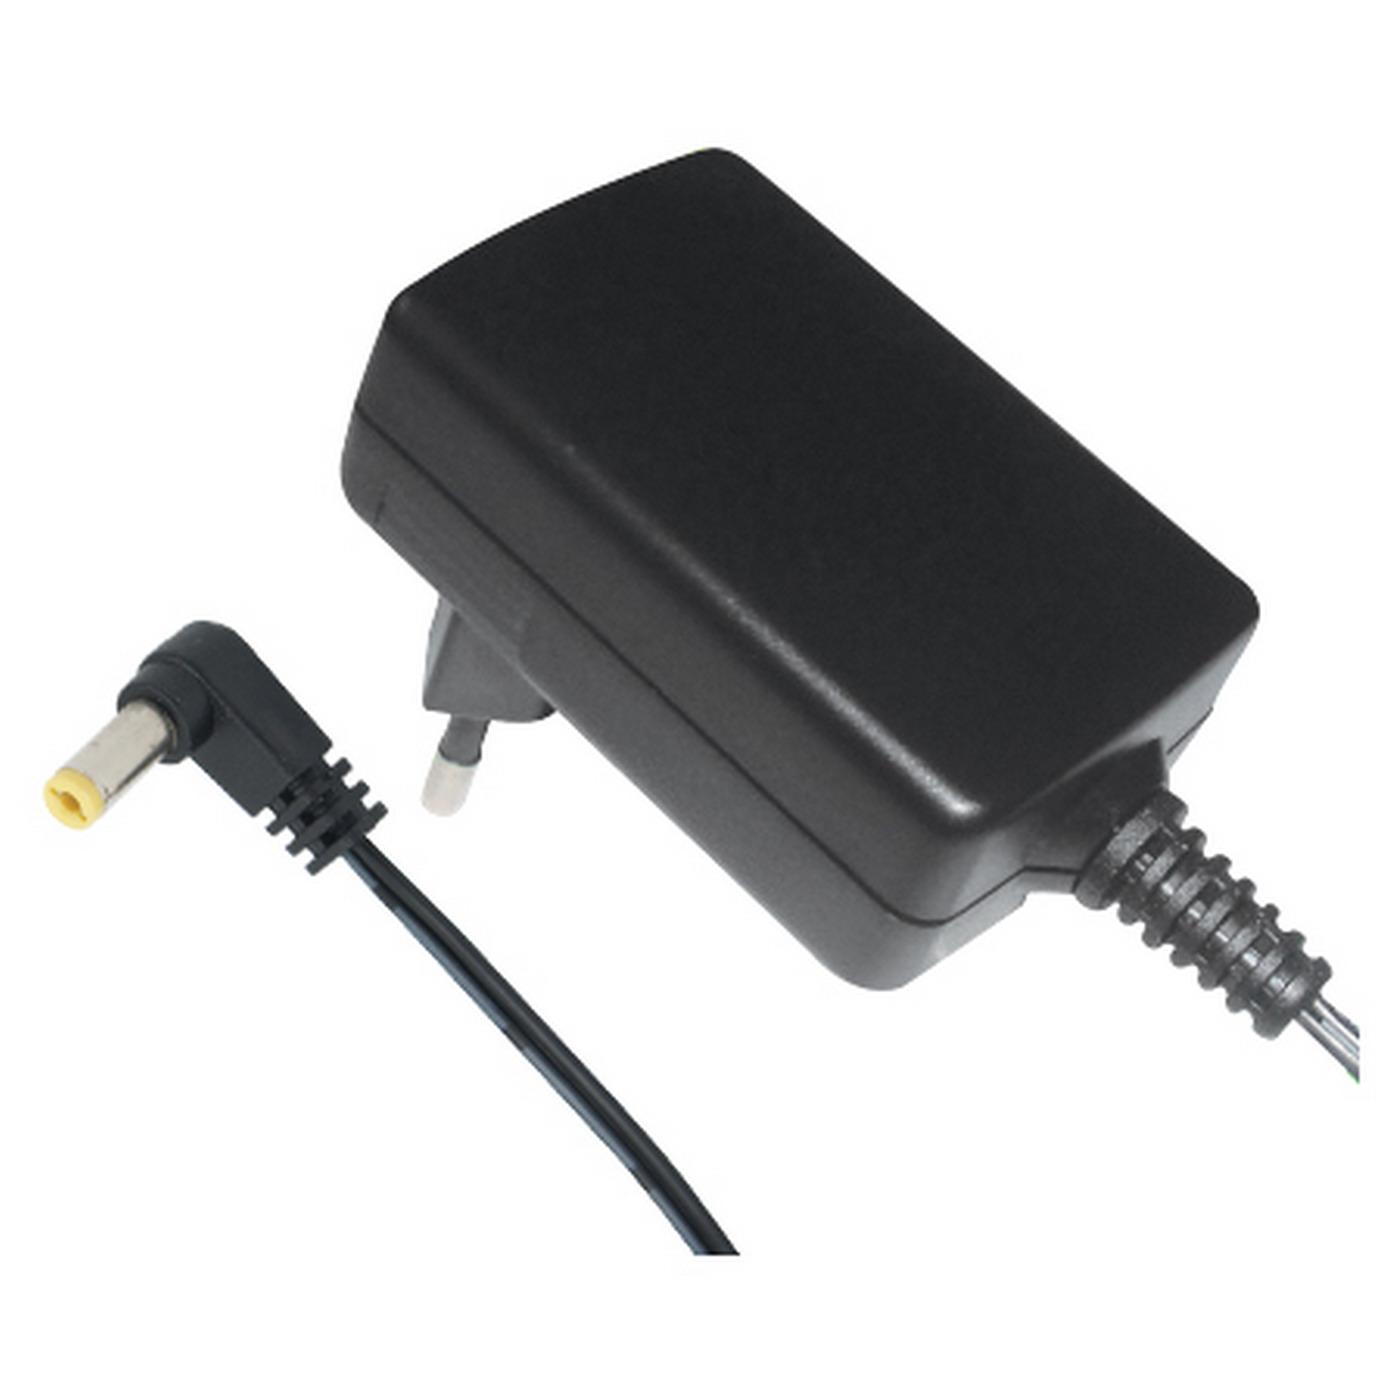 Alimentatore Switching 12VDC 1A Plug Fisso 5.5*2.1